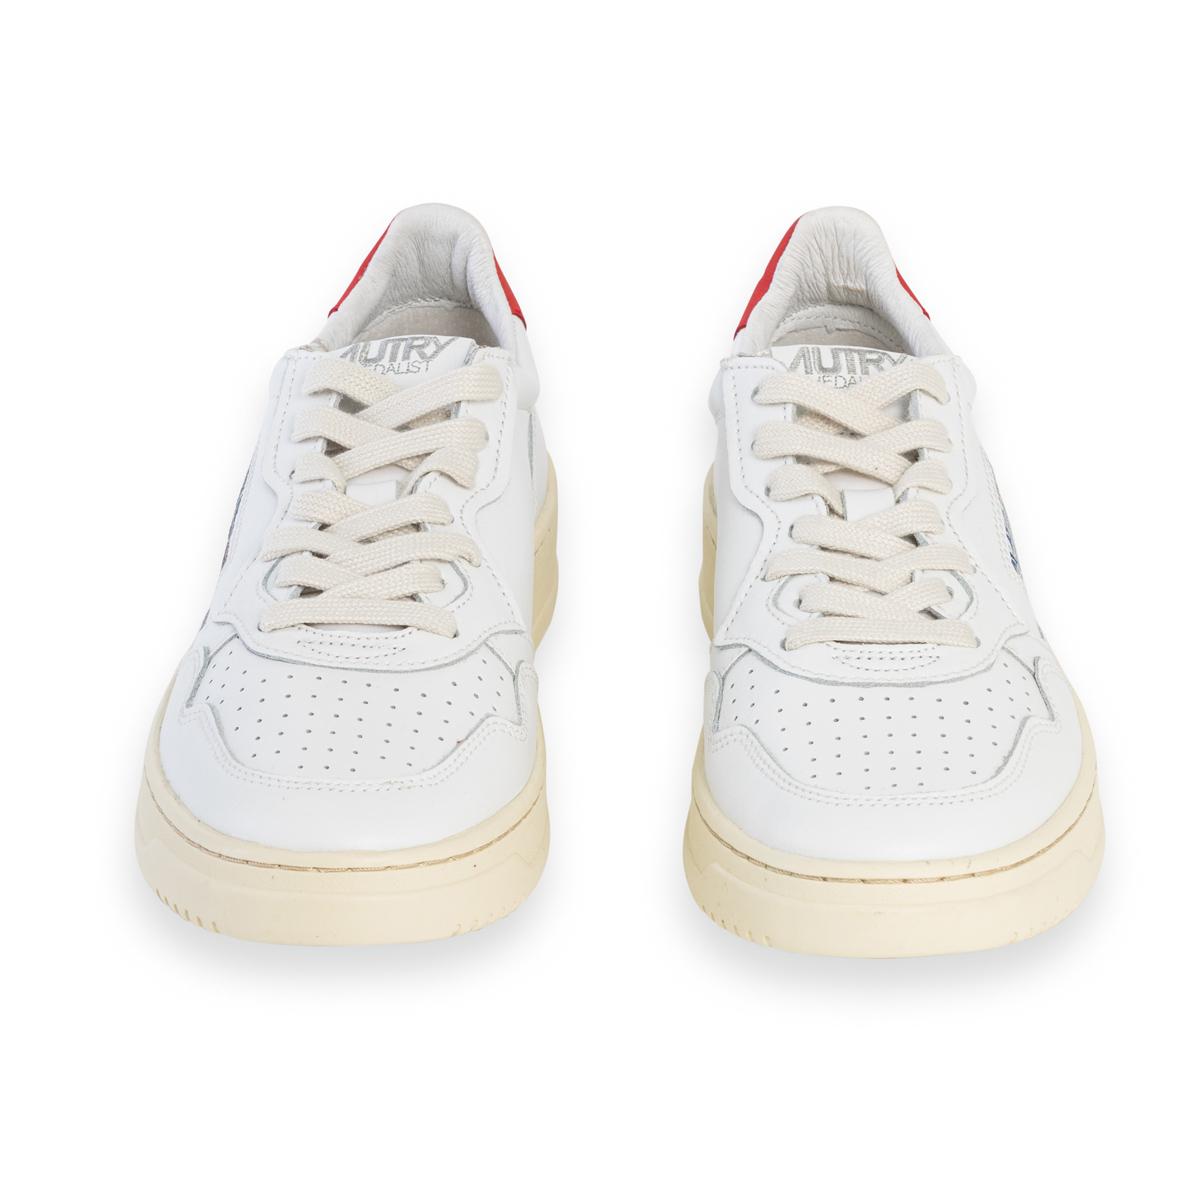 Sneaker Autry Bianca Logo Bianco